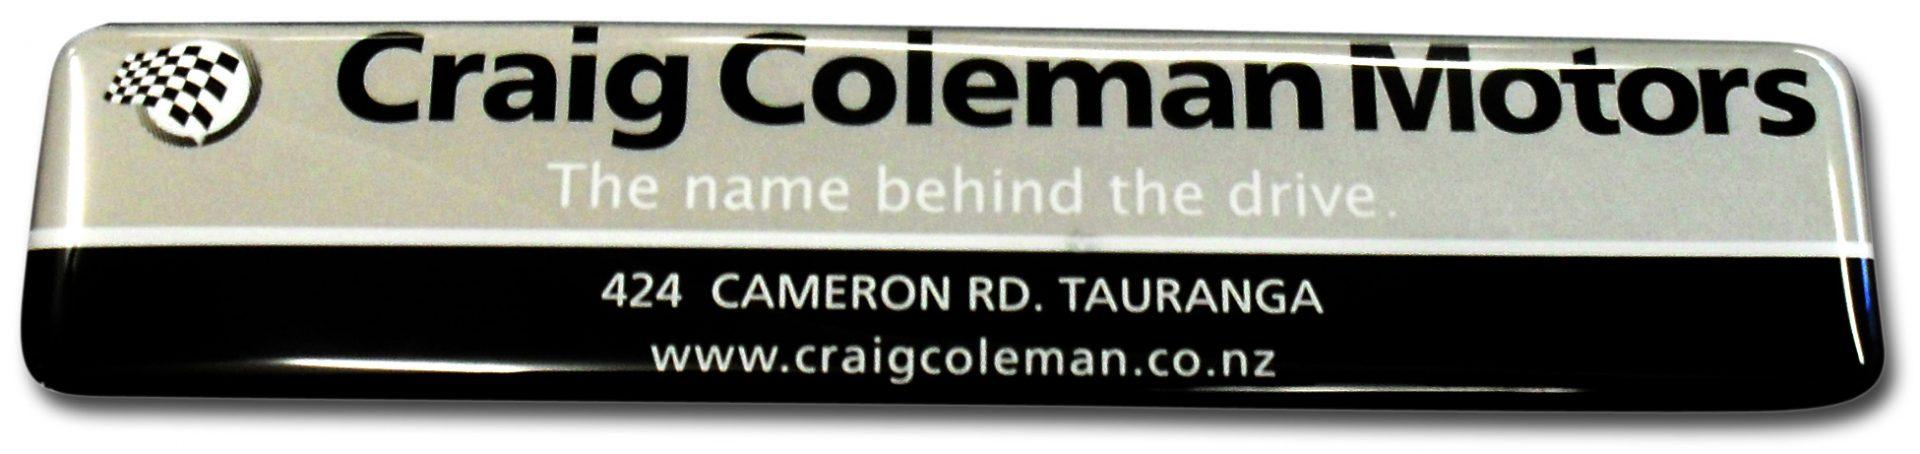 resin-Craig-Coleman